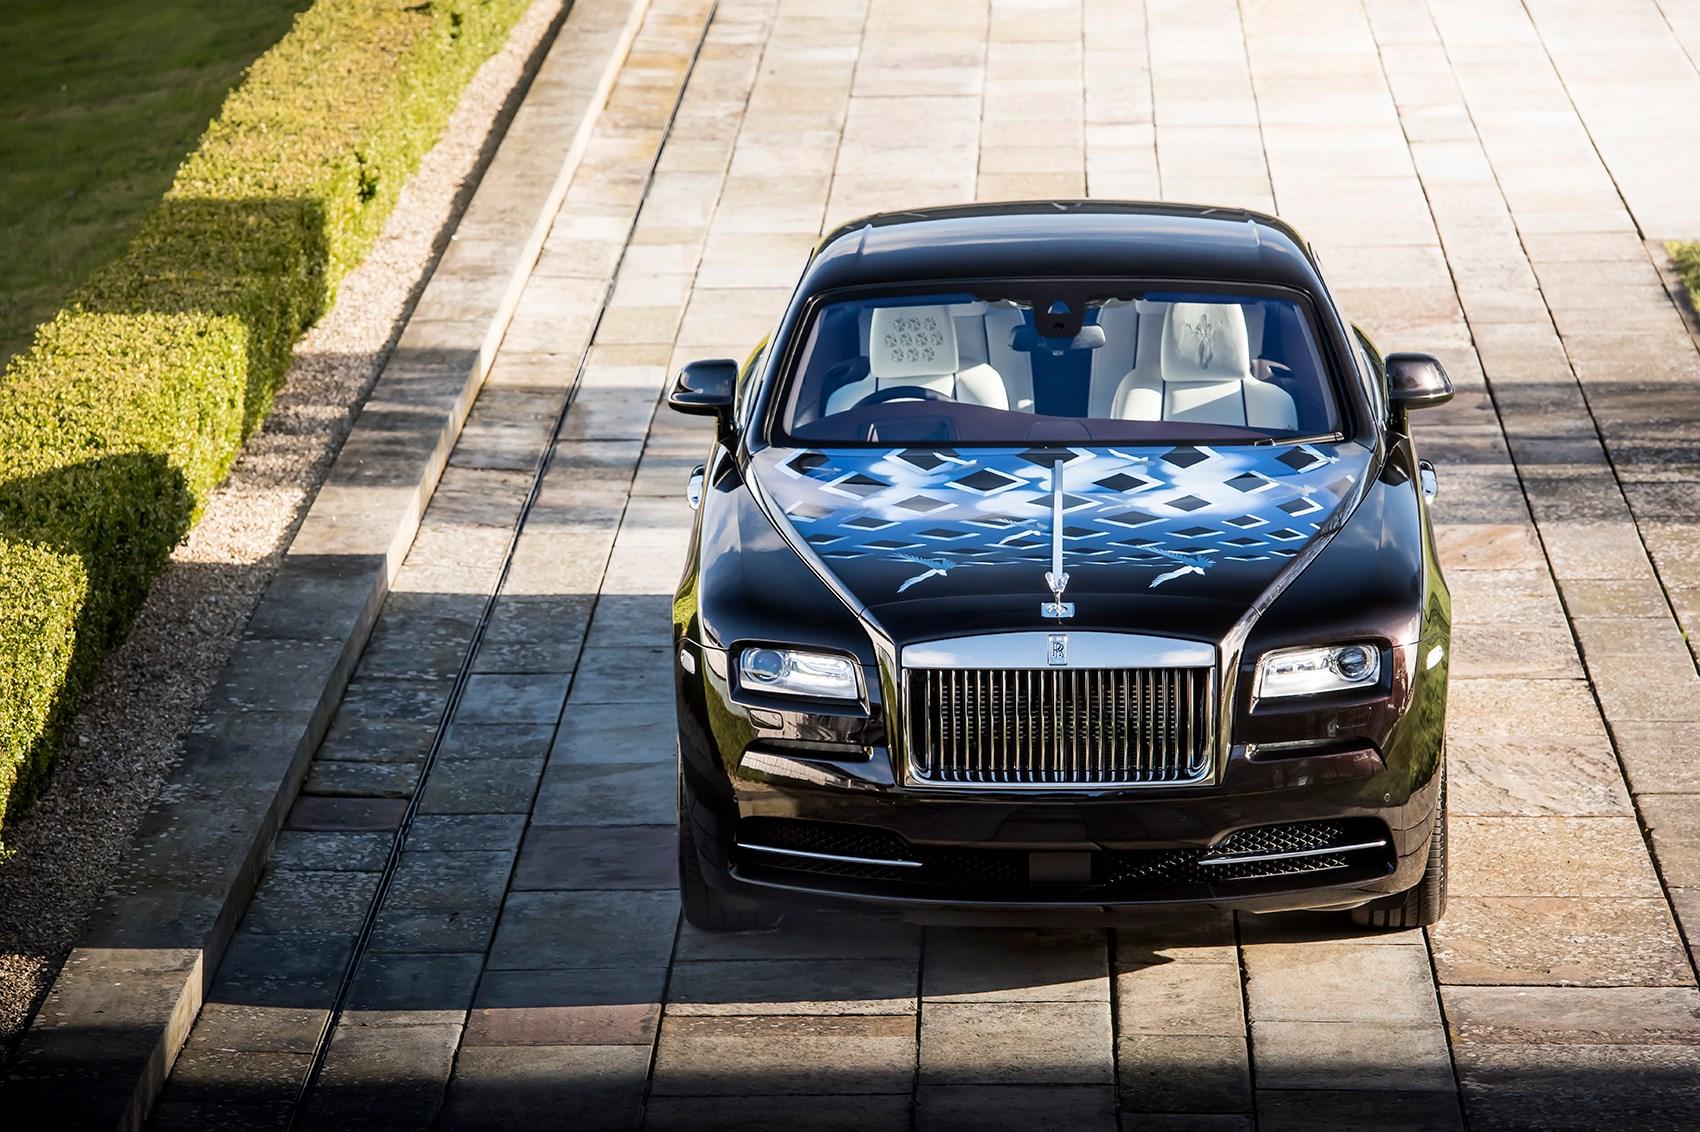 ... Rock 'n' Roller: Rolls-Royce Wraith 'Inspired by British Music' ...